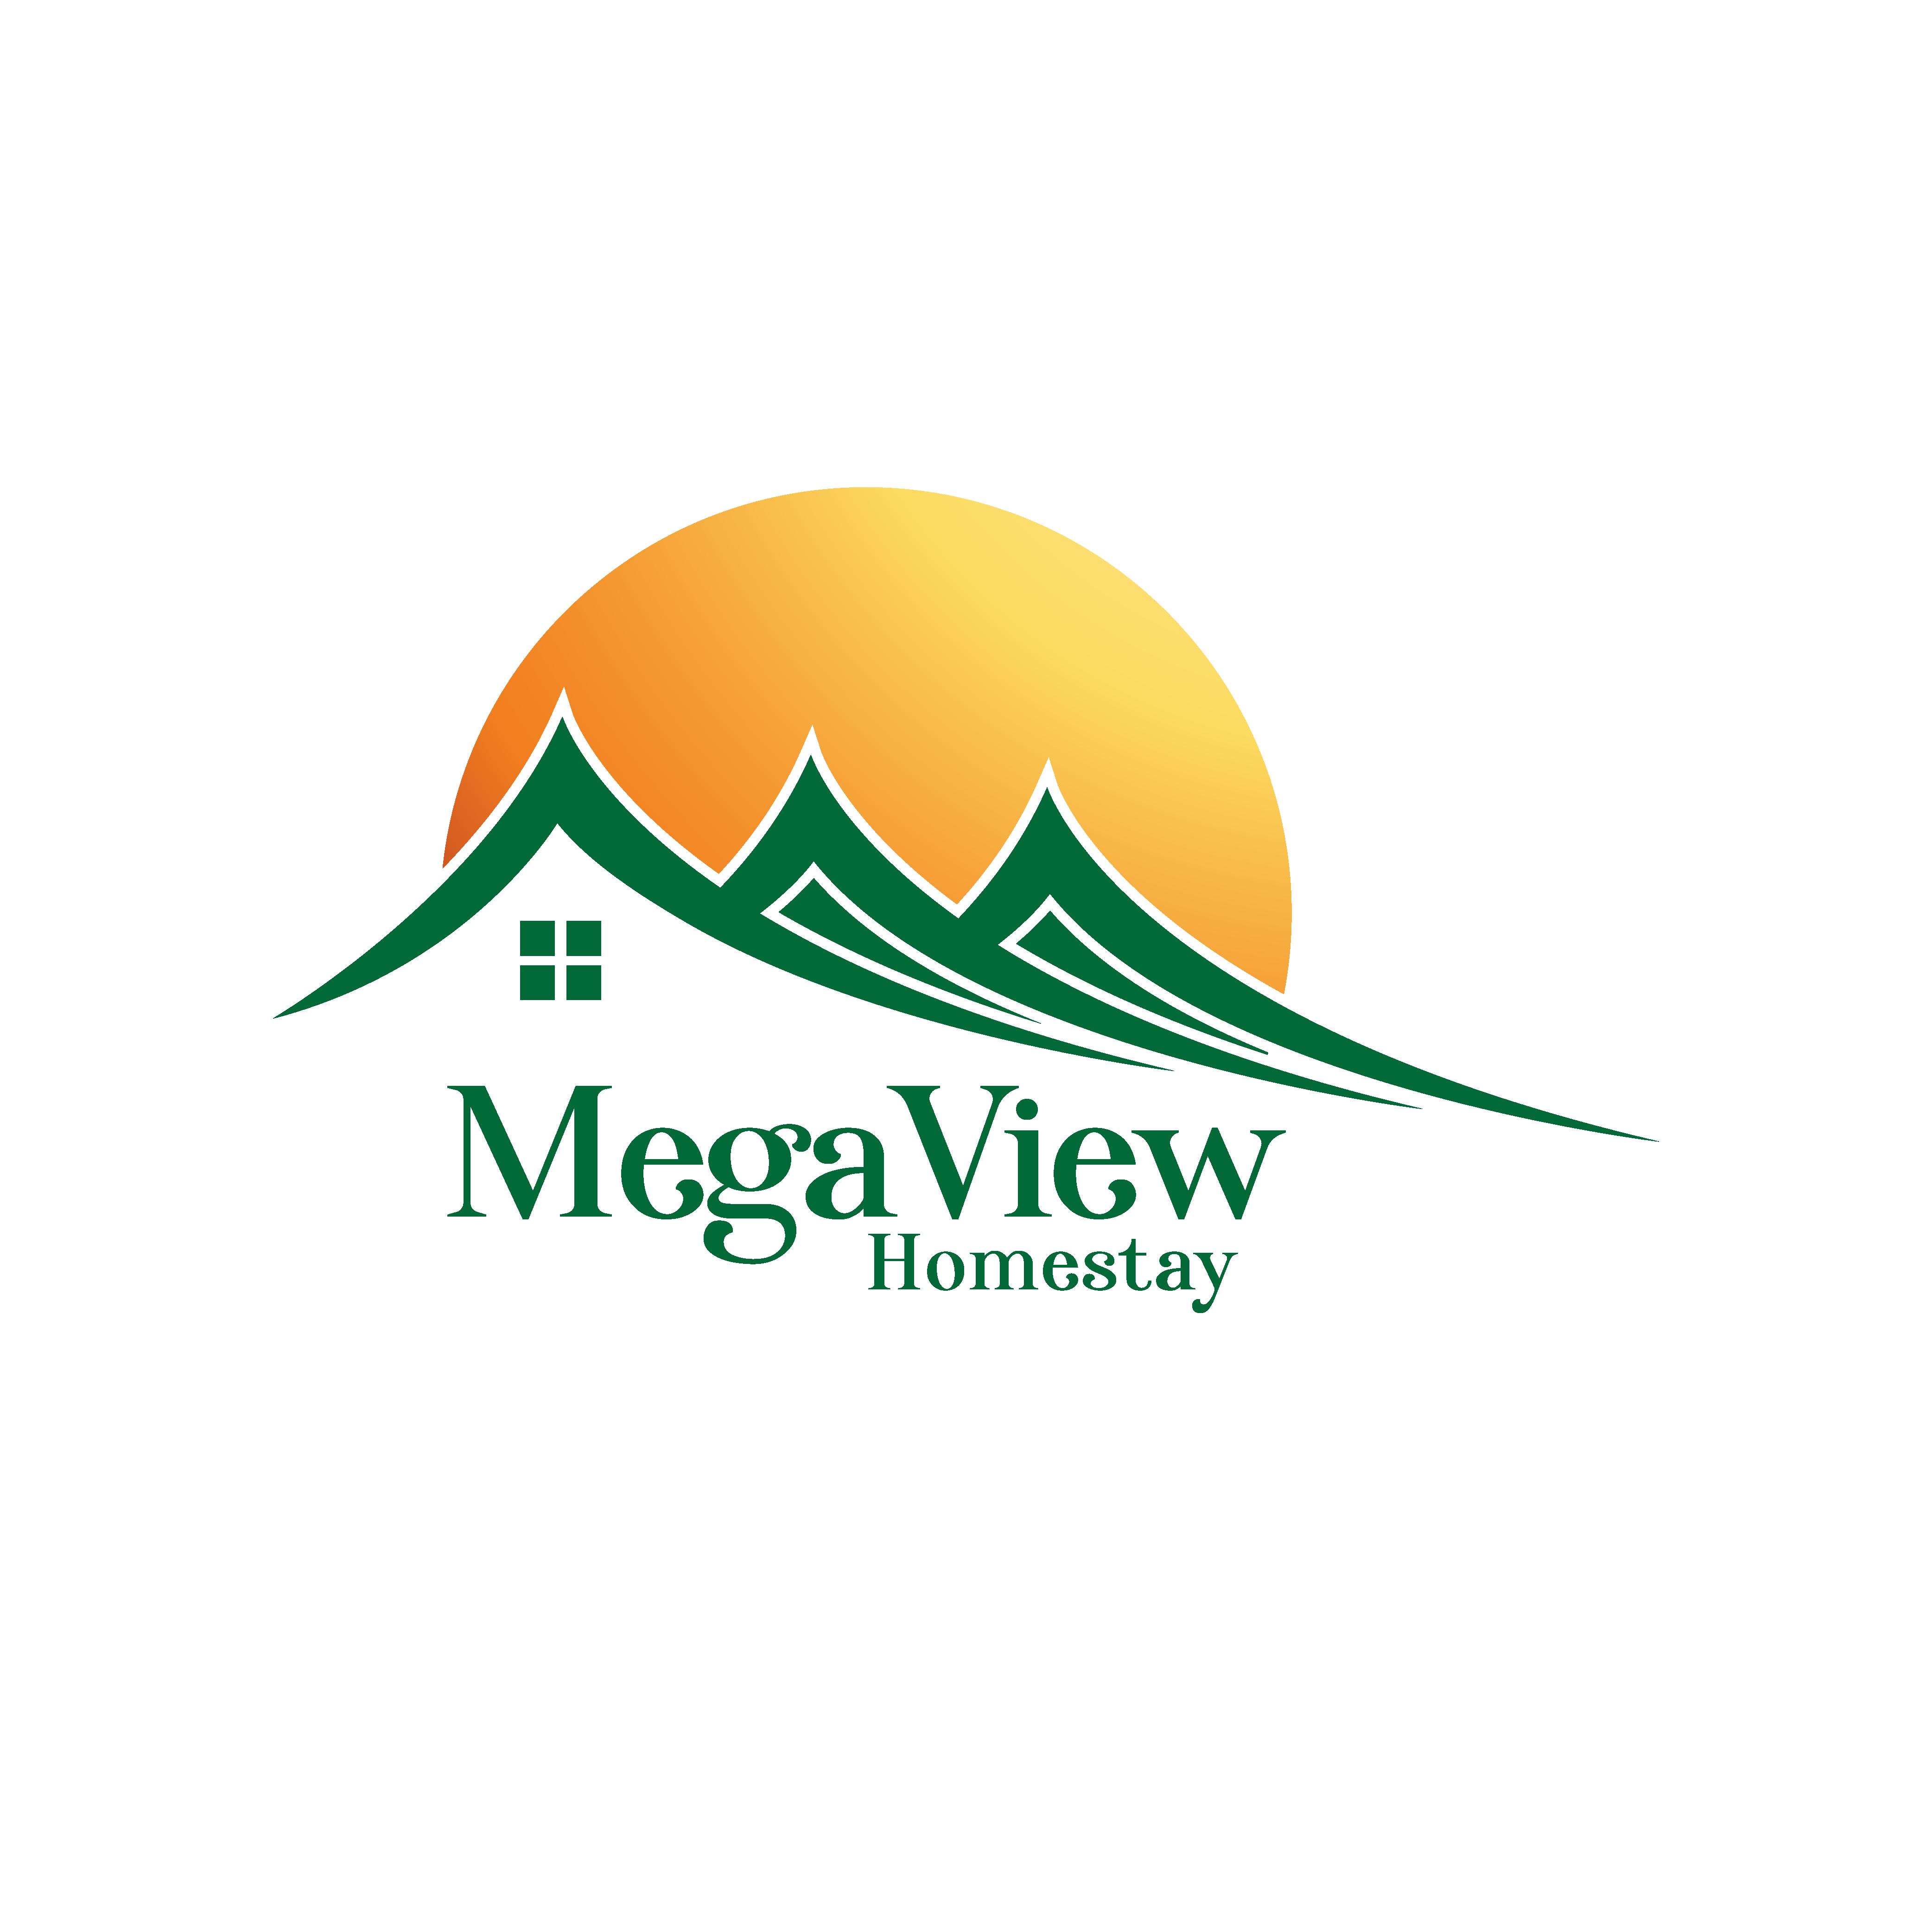 Mega View Homestay Logo